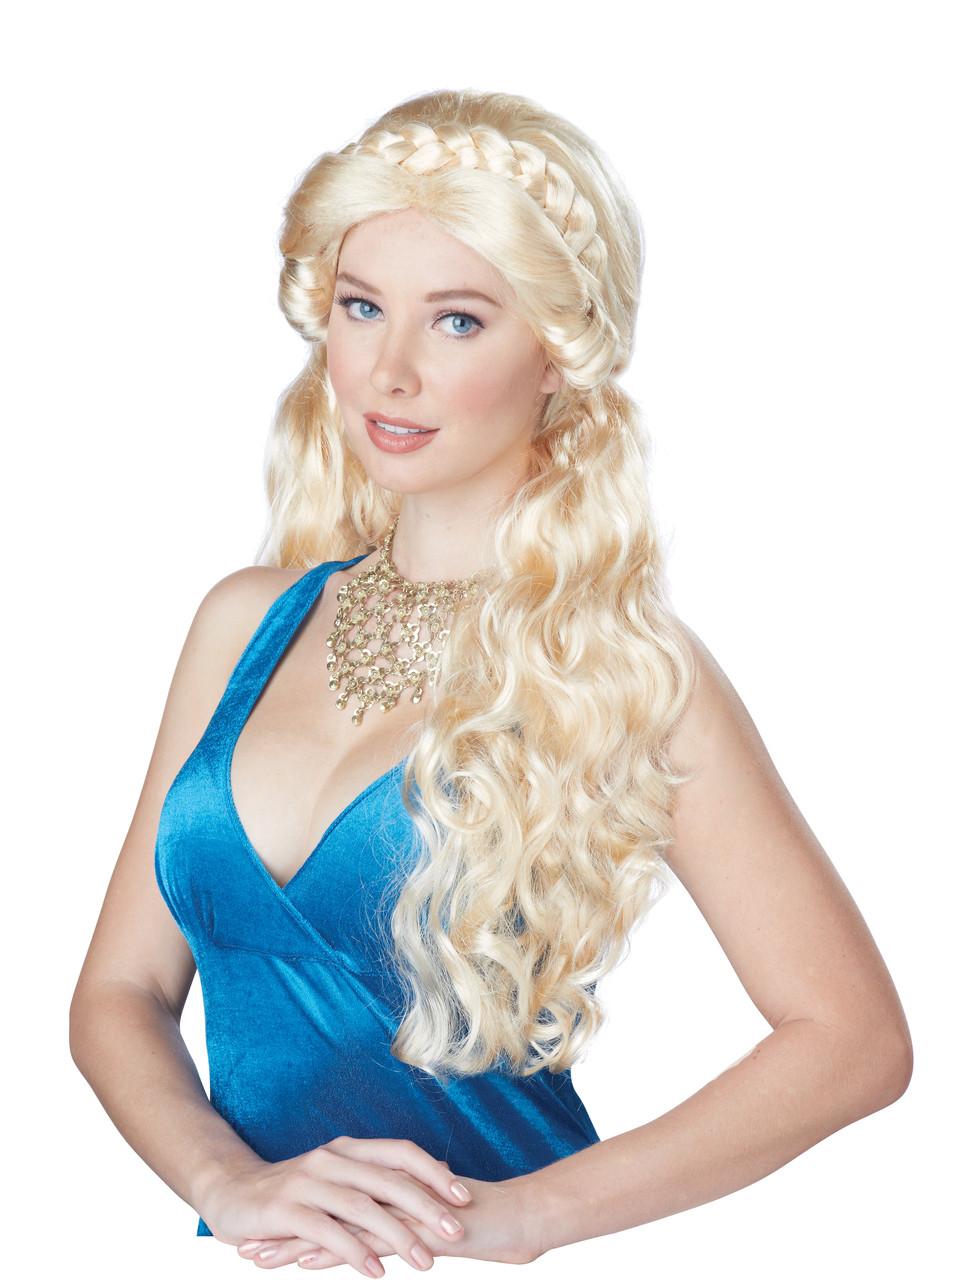 Online wigs Australia 103cb9bba3a6